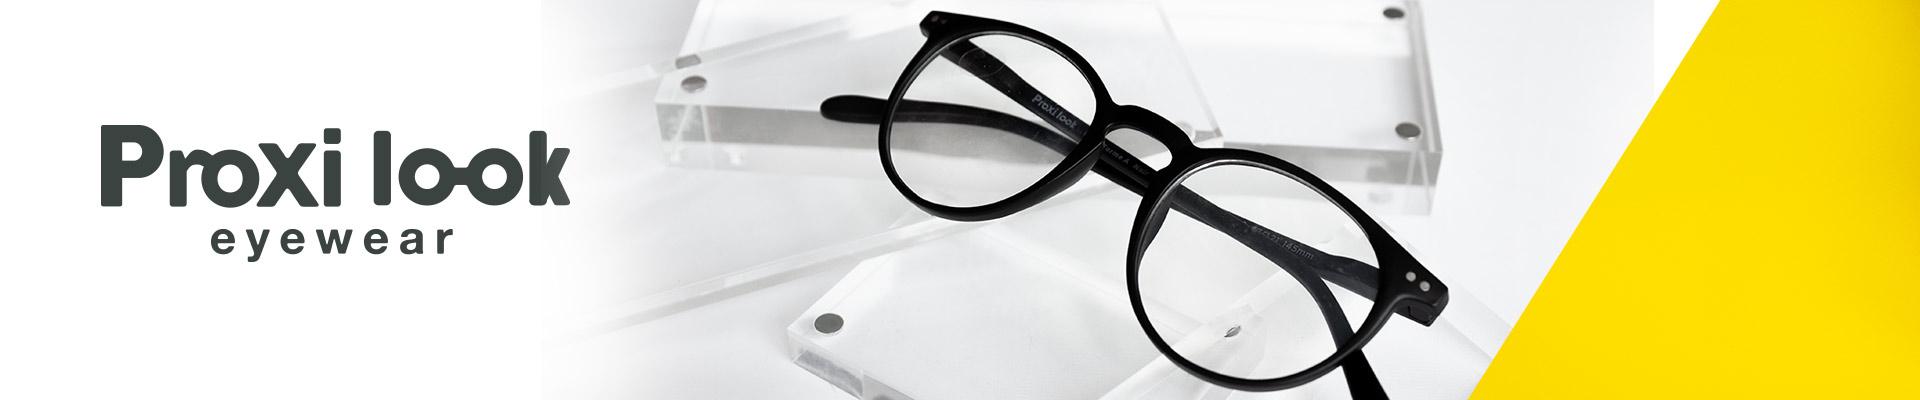 434a9f996f Optical Discount | Proxilook